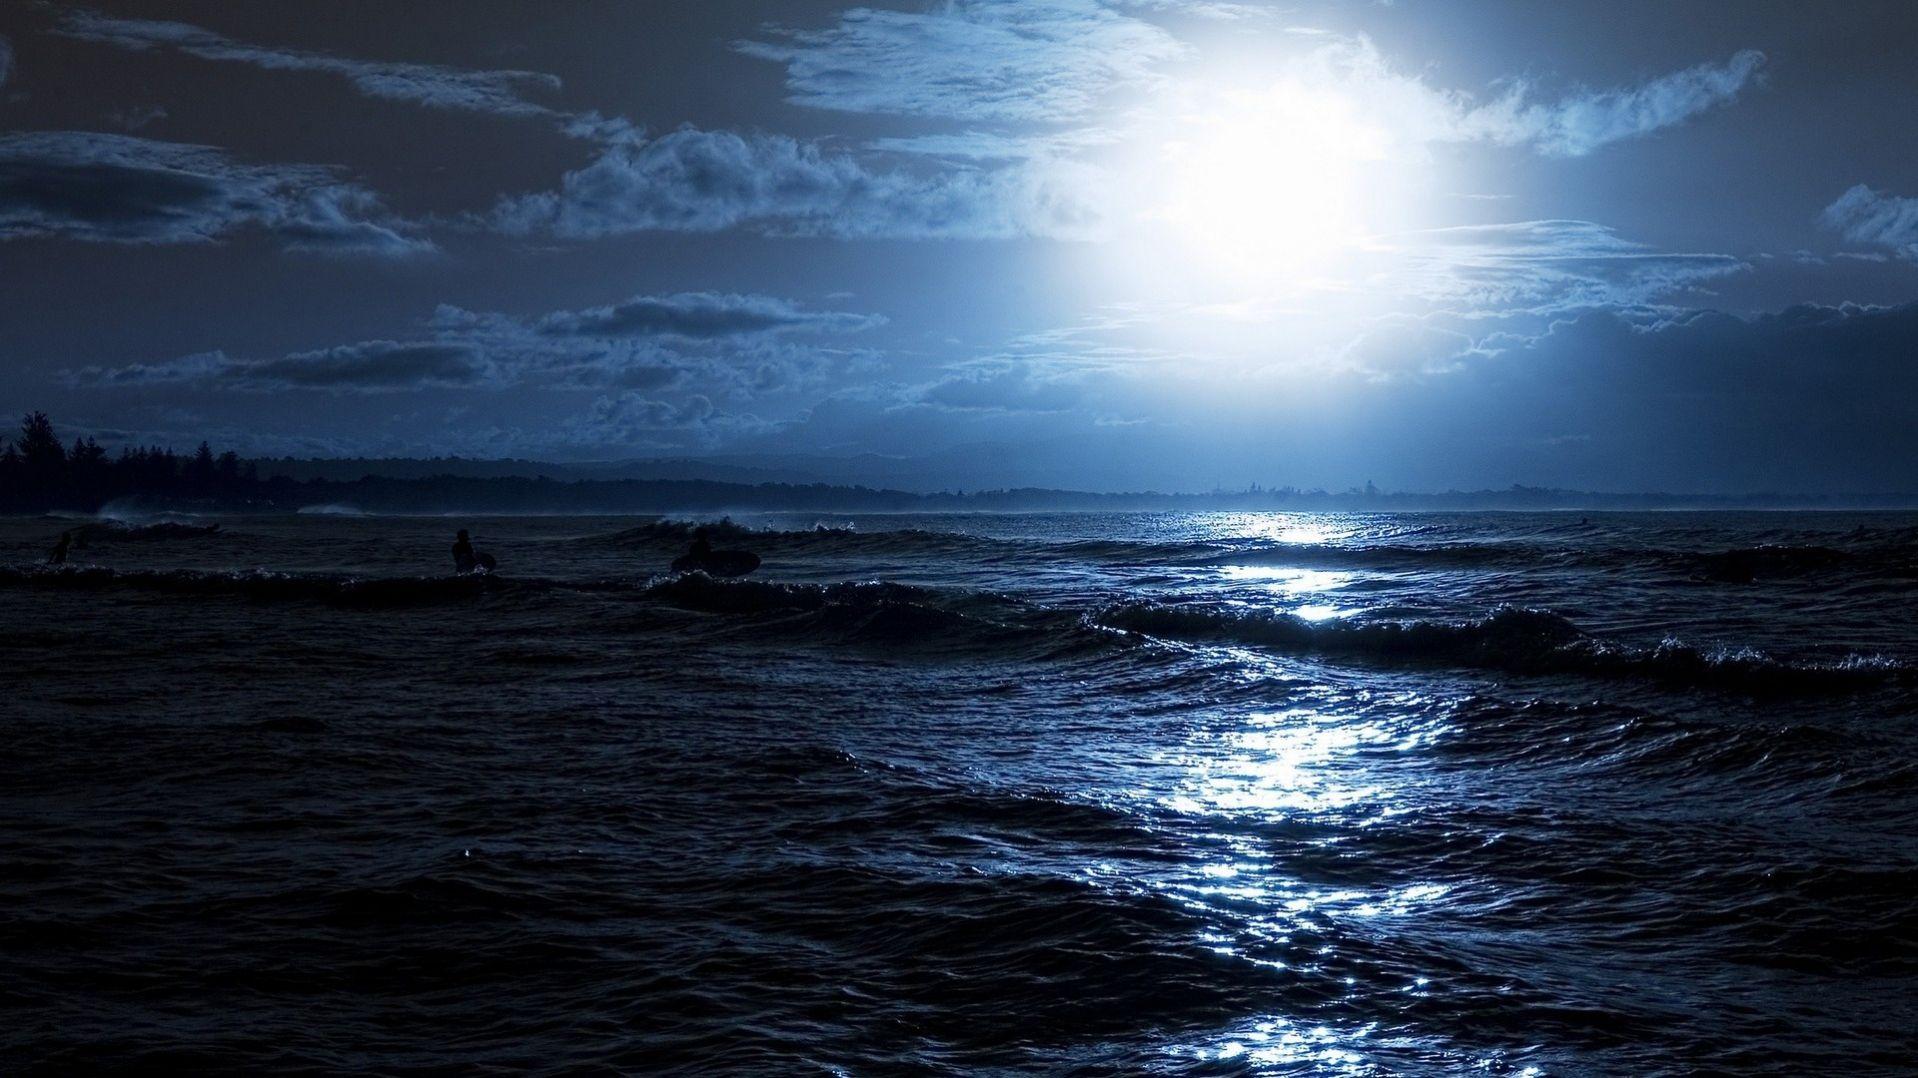 Dark Sea At Night Wallpapers In HD